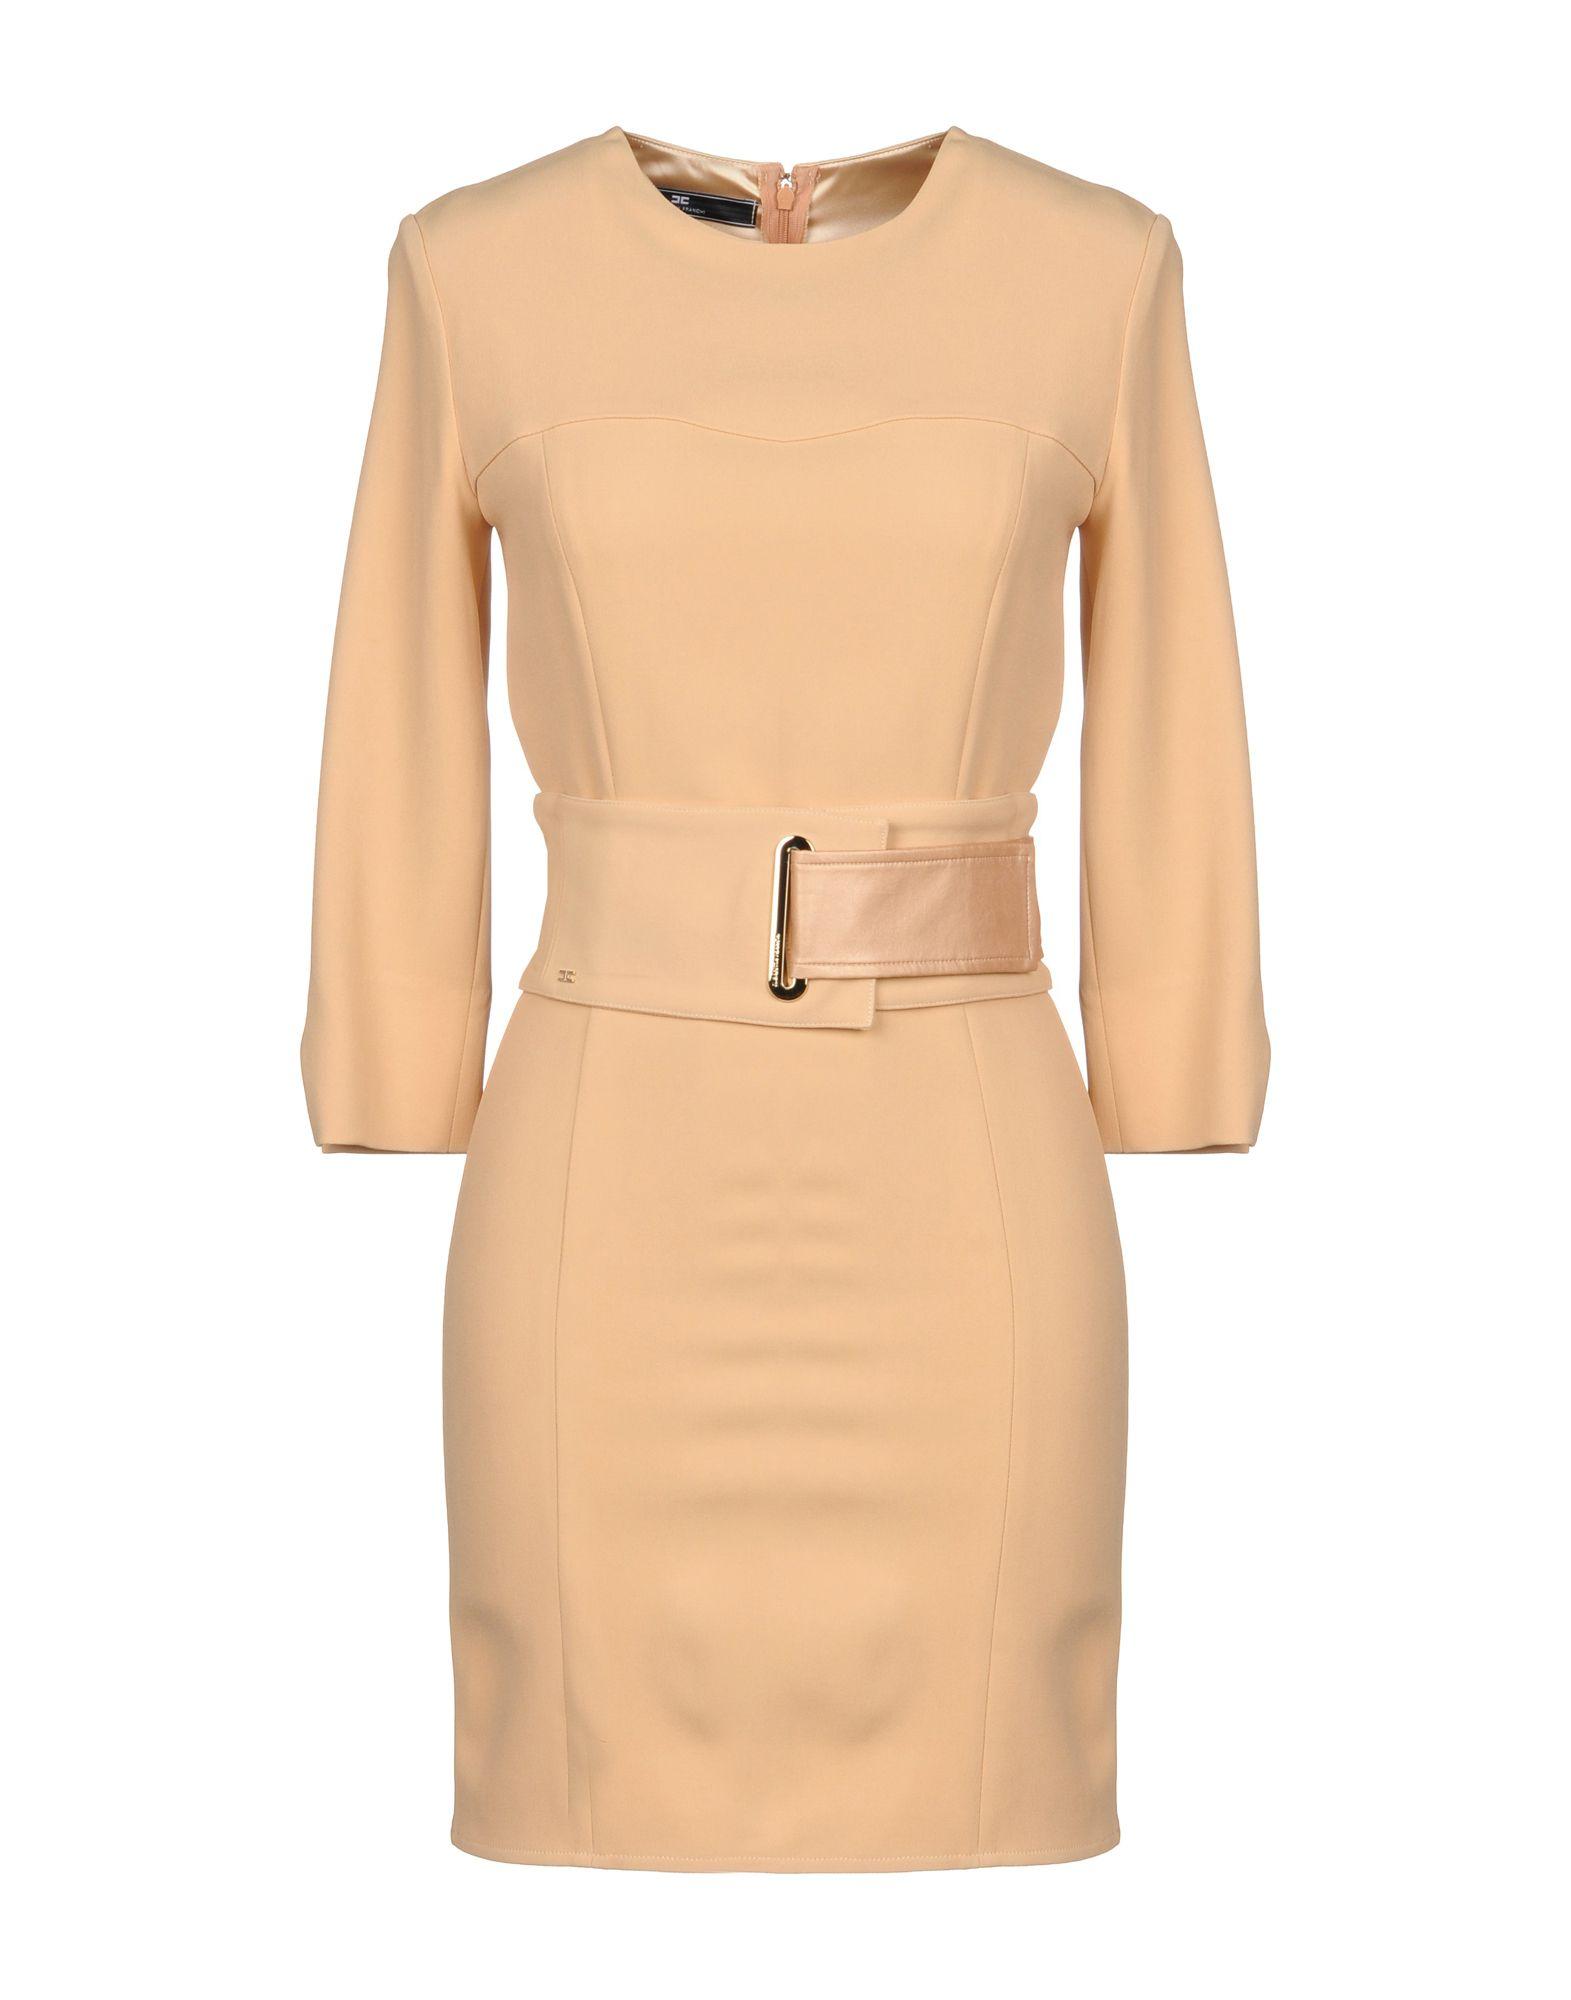 ELISABETTA FRANCHI 24 ORE Короткое платье petek pt301 091 26 petek